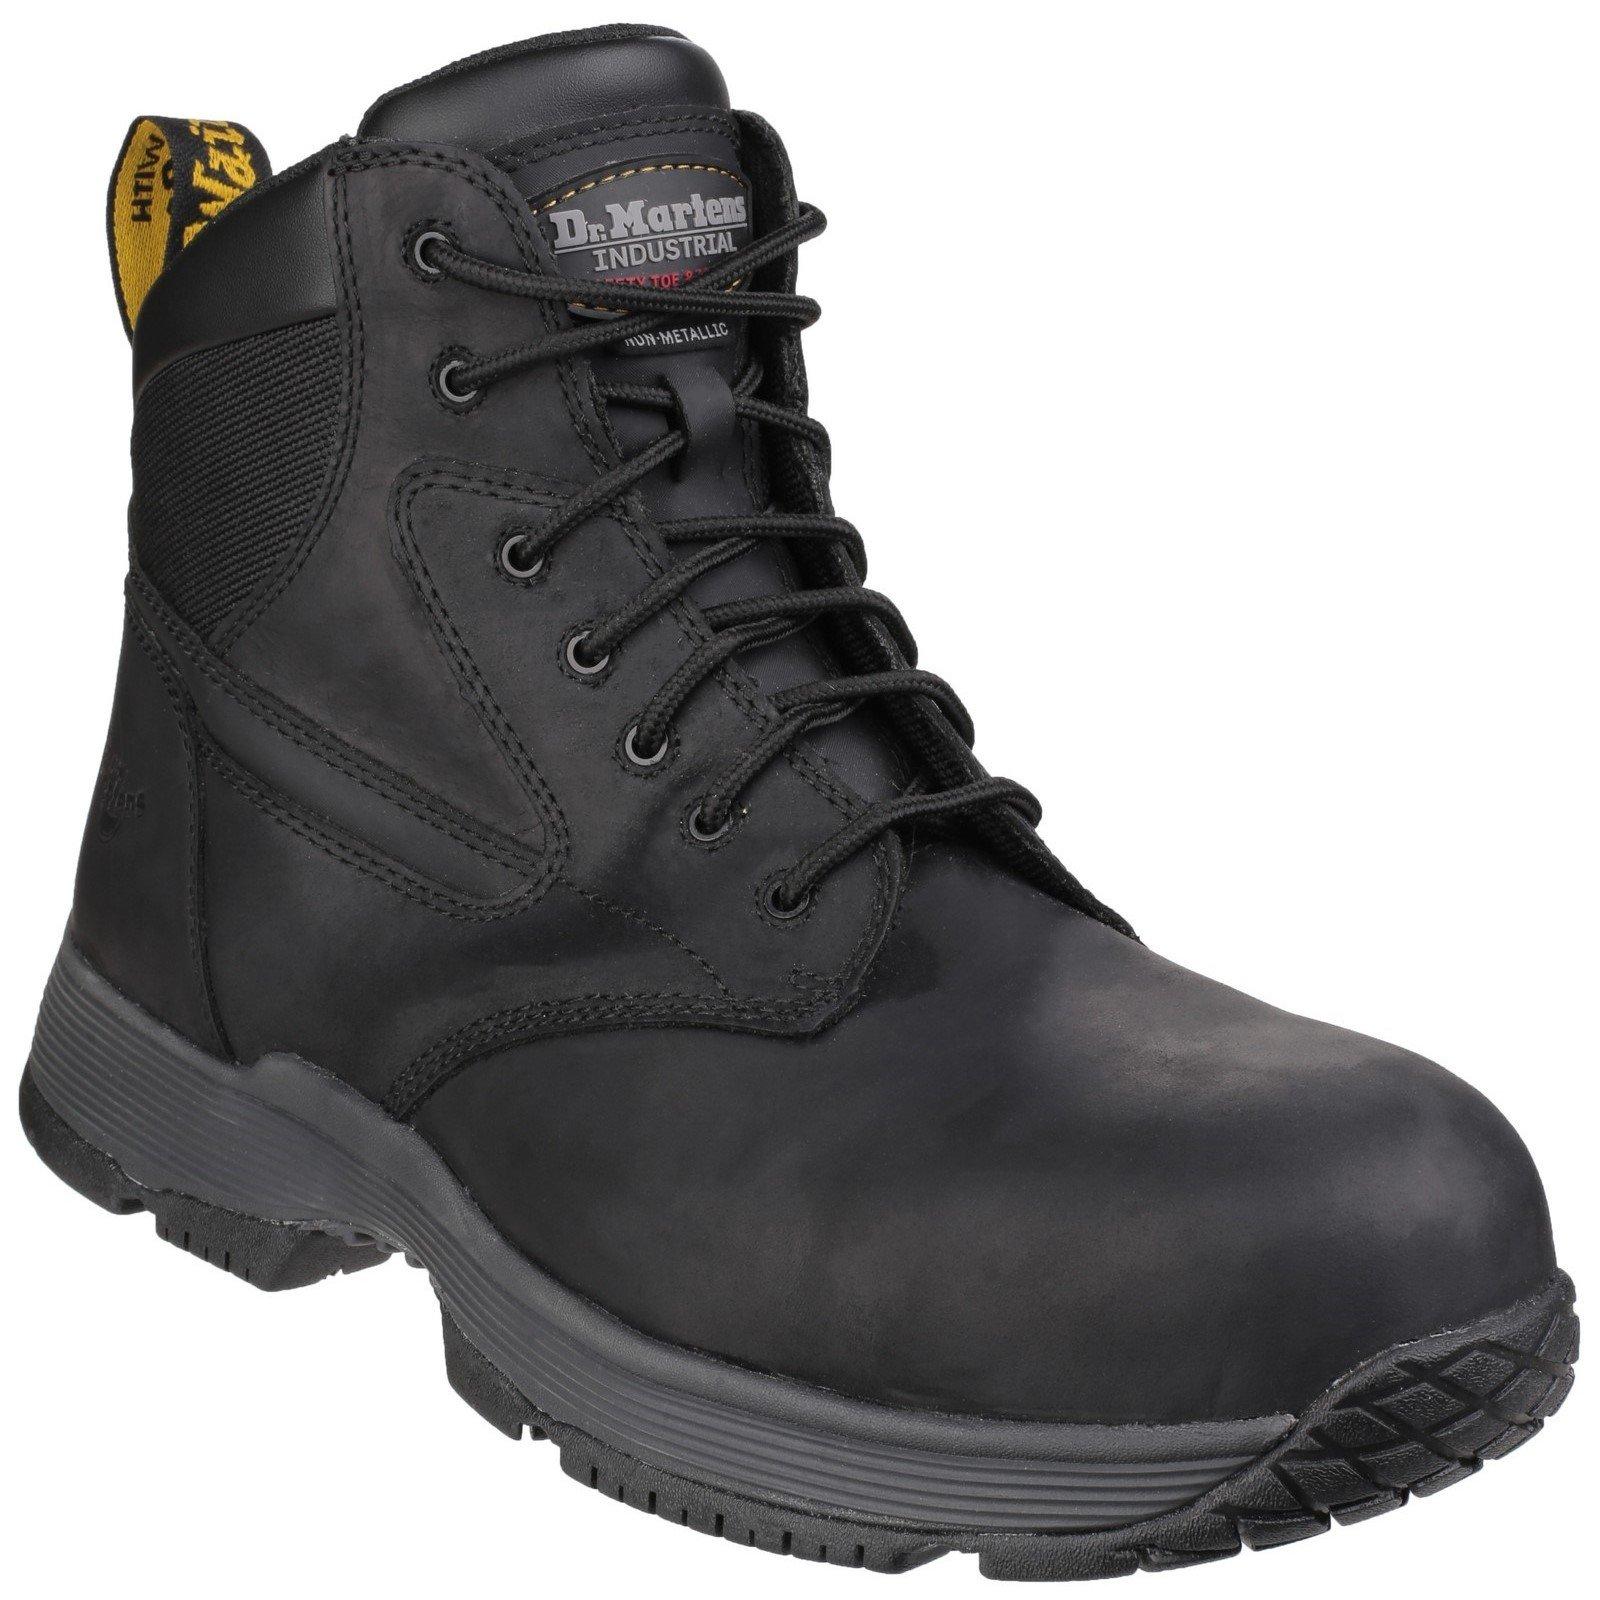 Dr Martens Unisex Corvid Composite Lace up Safety Boot Black 24862-41125 - Black 8